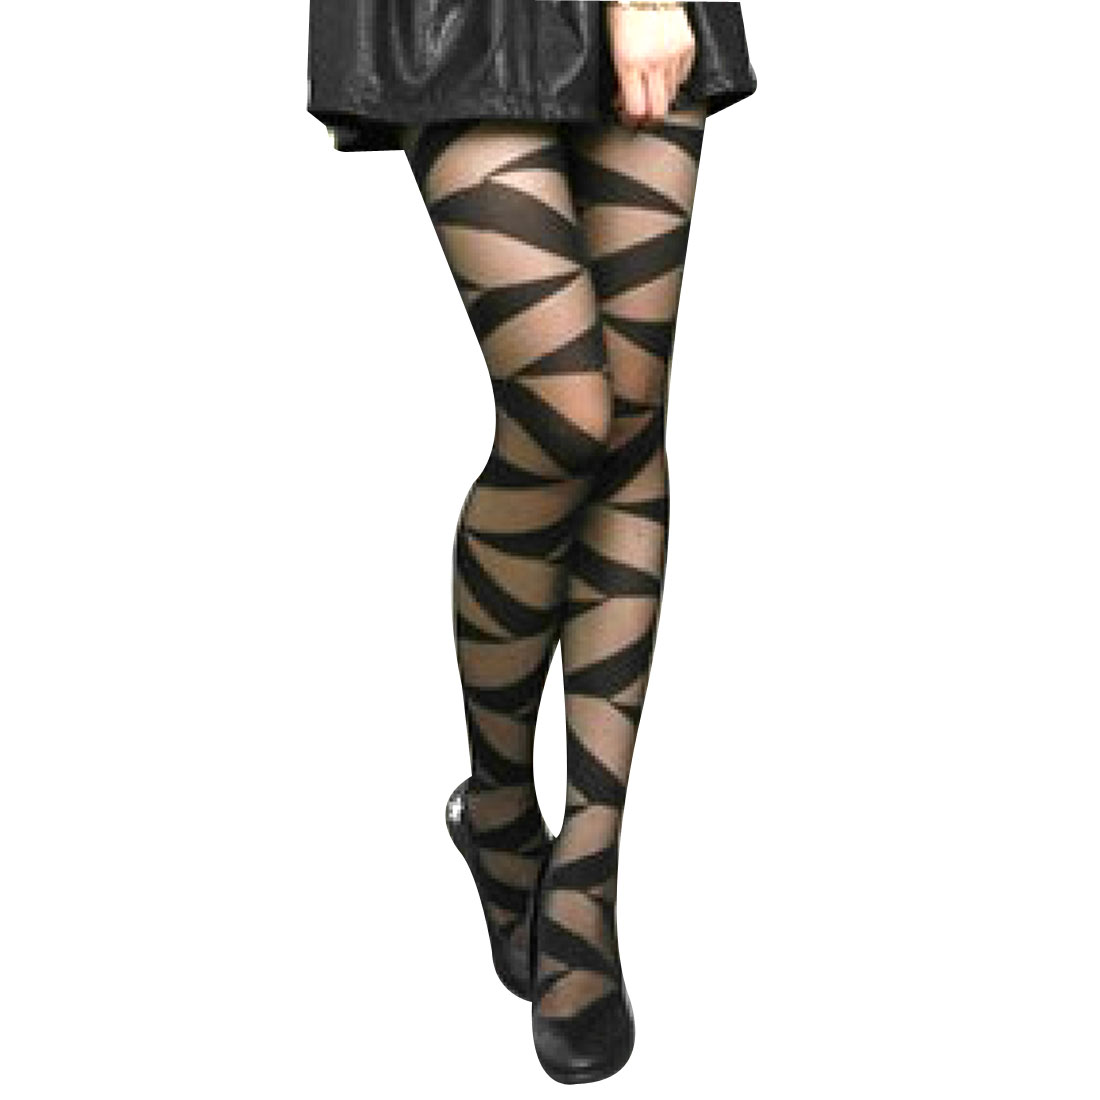 Ladies Black Stripe Sheer Elastic Closefitting Pantyhose Tights XS